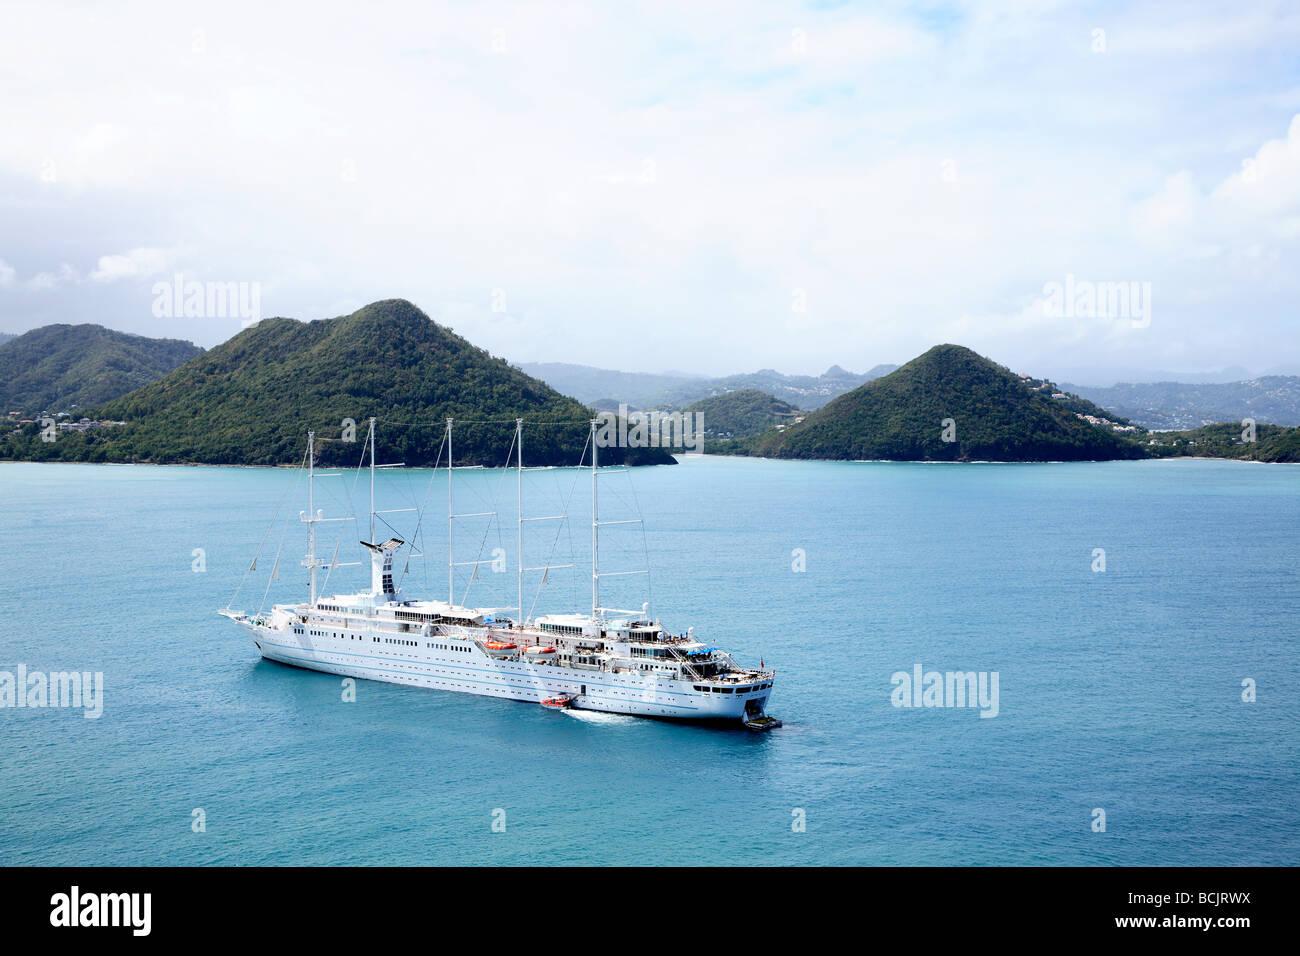 Schooner cruise ship in sea near st lucia - Stock Image